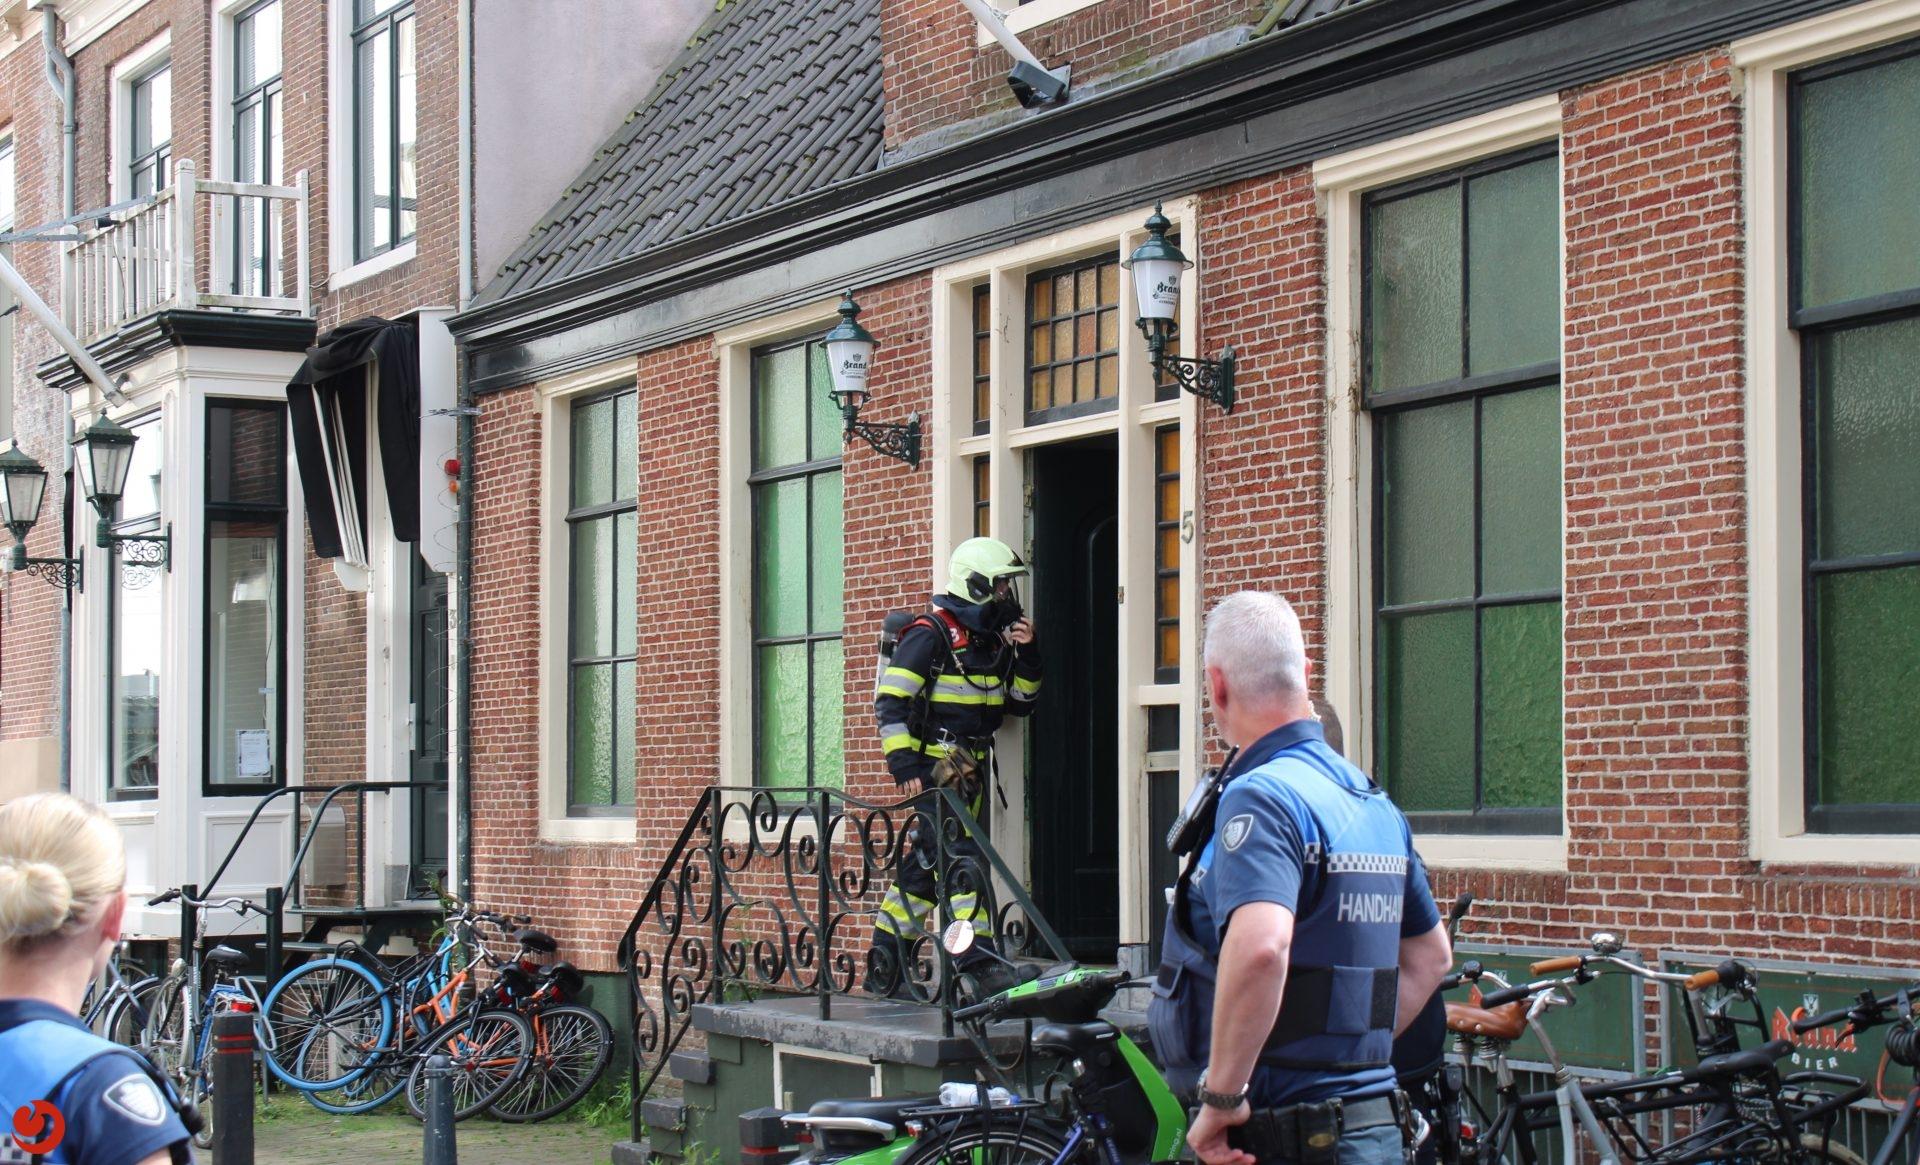 Sociëteit 't Heertje in Leeuwarden kort ontruimd wegens lekkage